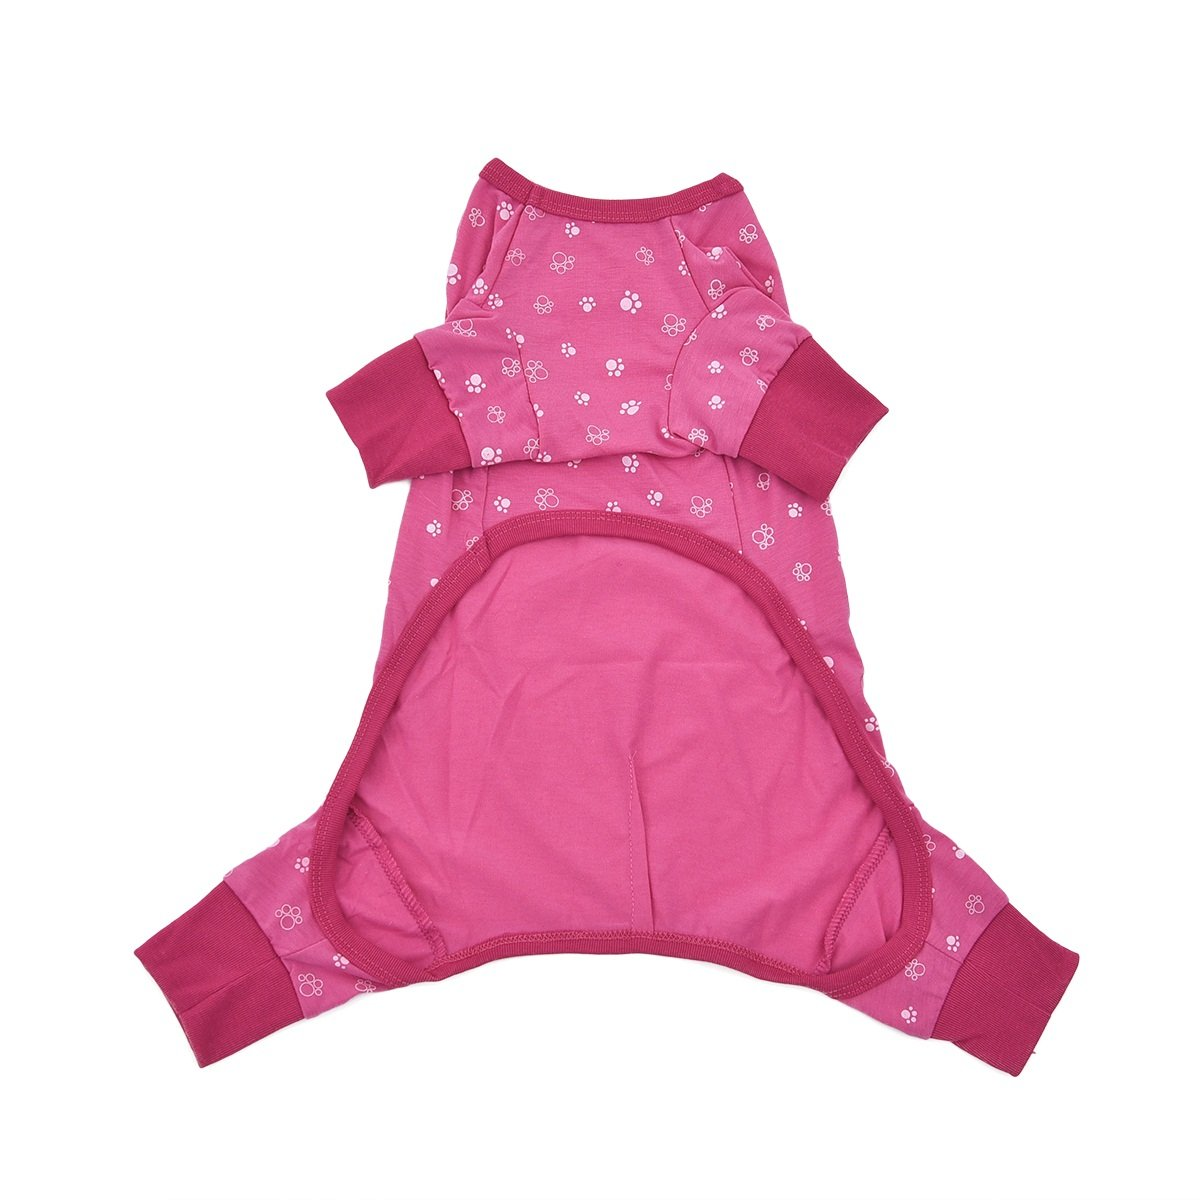 Perro Ropa Caliente Pet Pijamas Suave Cachorro Traje Transpirable Cat Jumpsuit Pet Supplies LUYIASI Color : Pink , Tama/ño : S